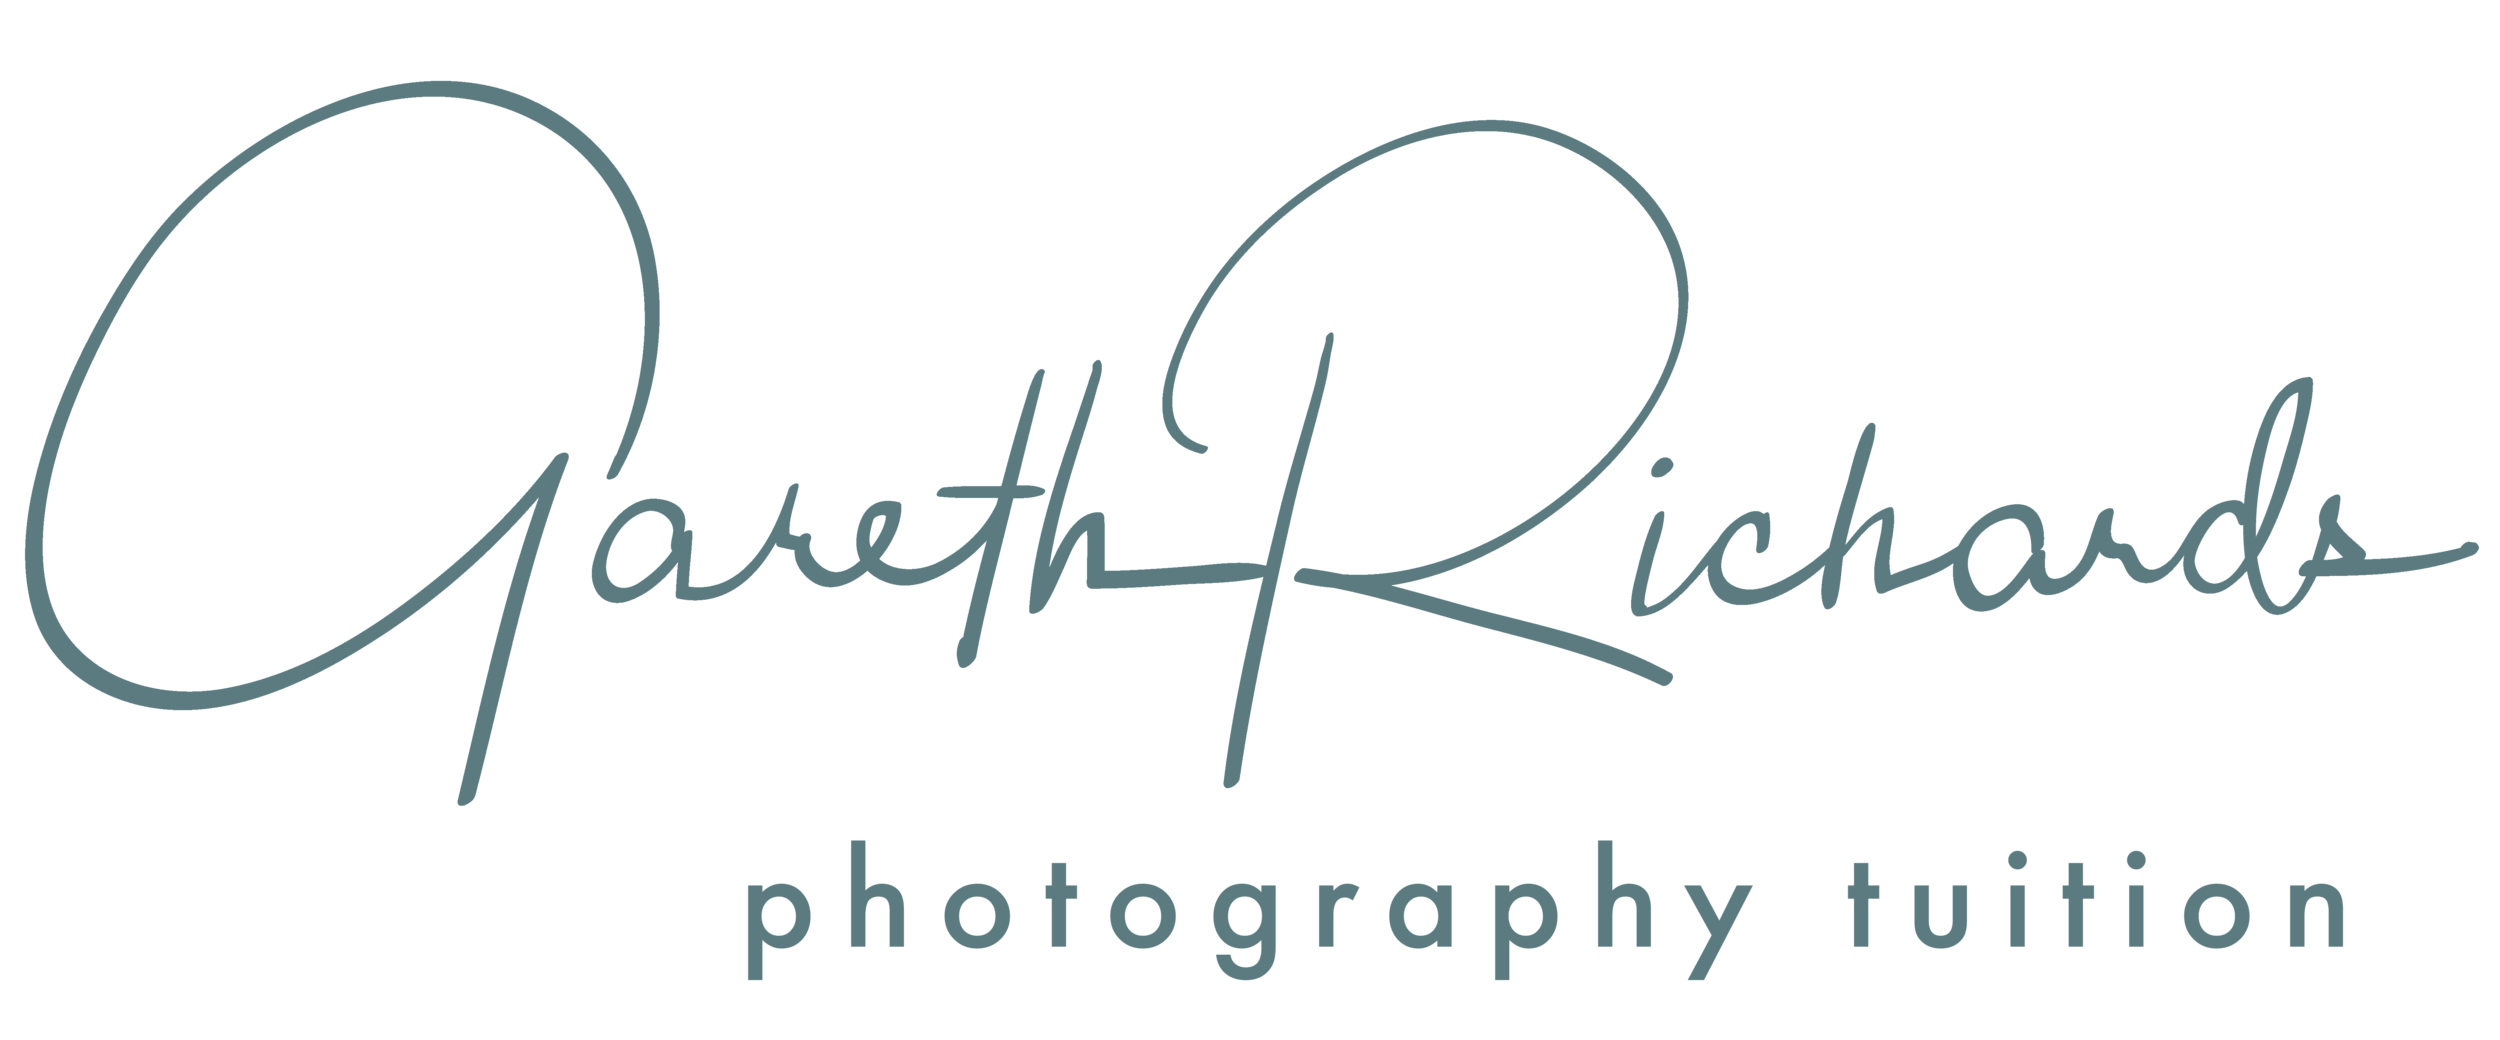 Gareth-Richards Tuition-Turq-highres Crop.png